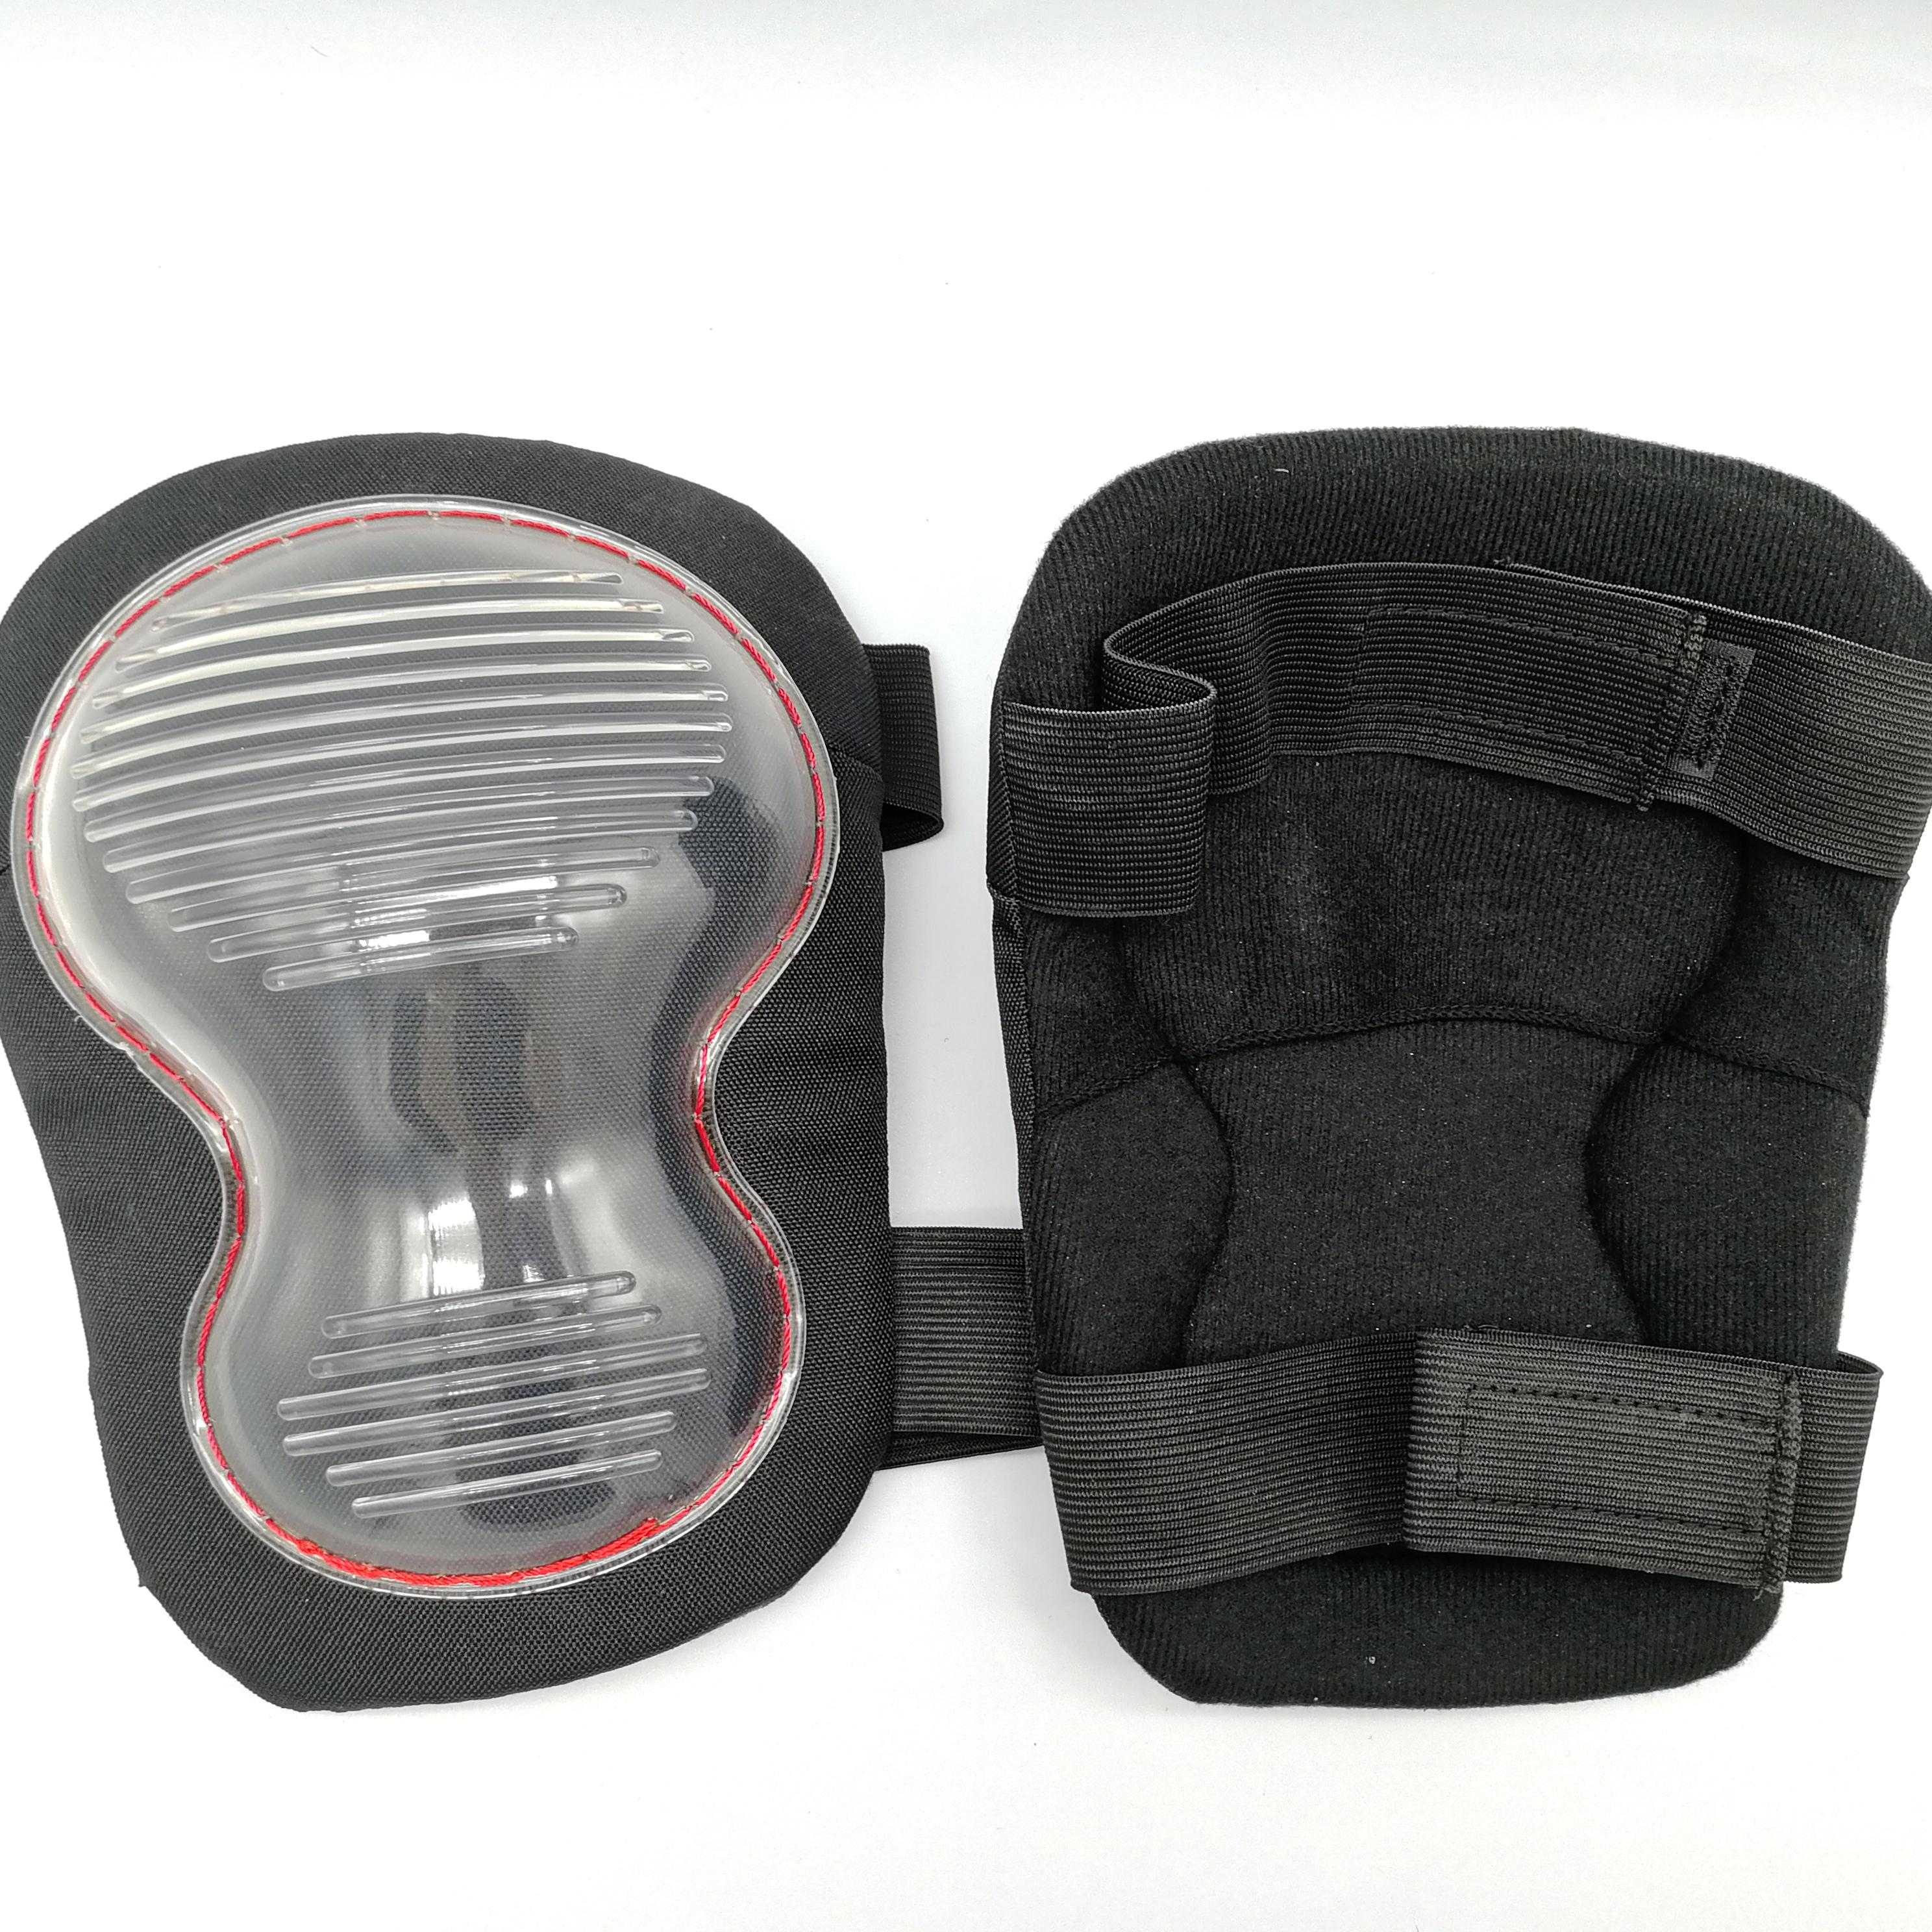 Home Lightweight work knee pads for gardening